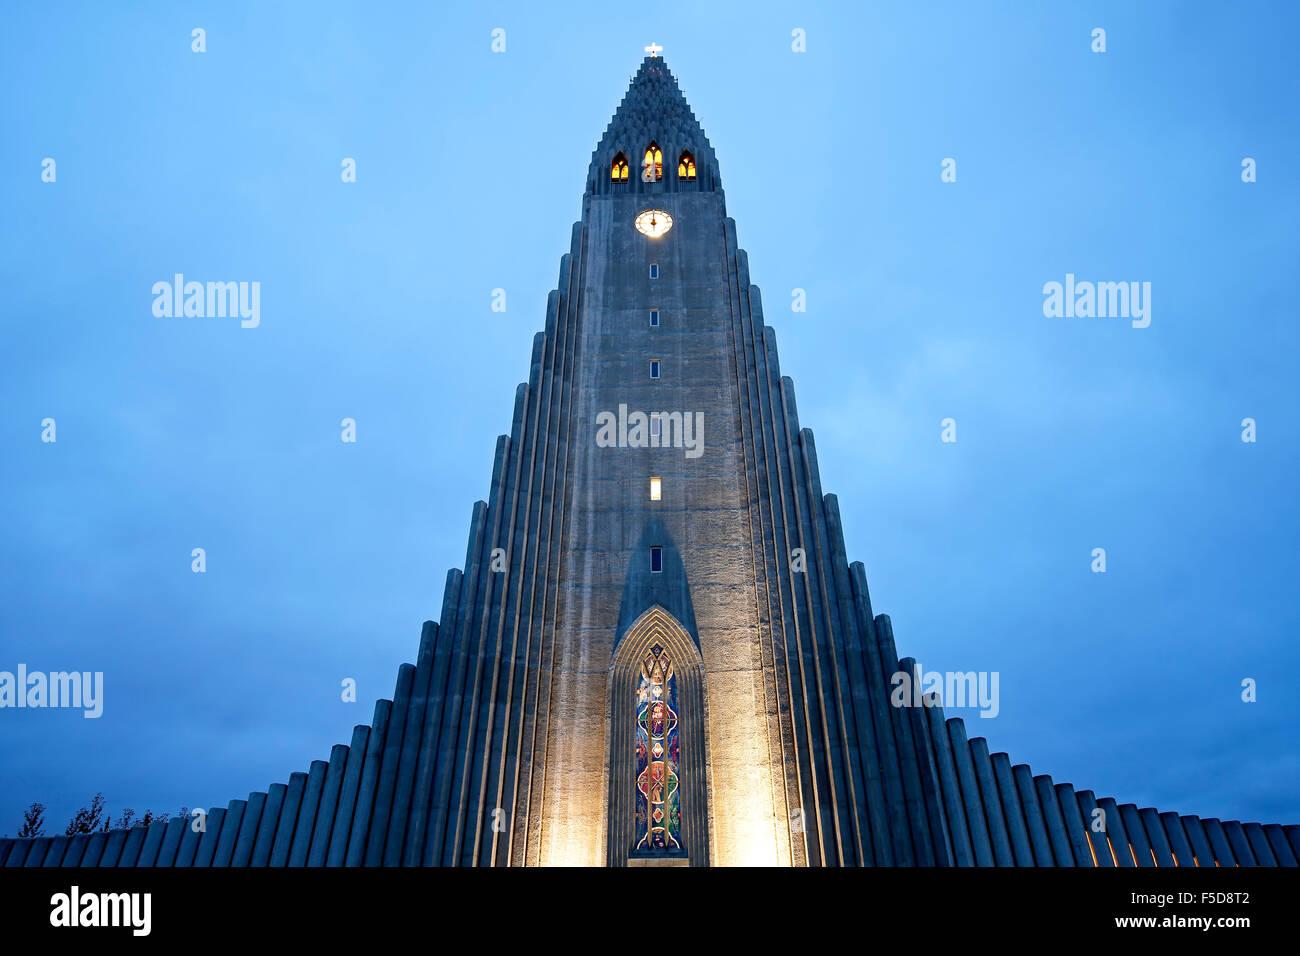 La Iglesia Hallgrimskirkja Hallgrims (Arquitecto Guðjón Samúelsson del Estado), Reykjavik, Iceland Imagen De Stock